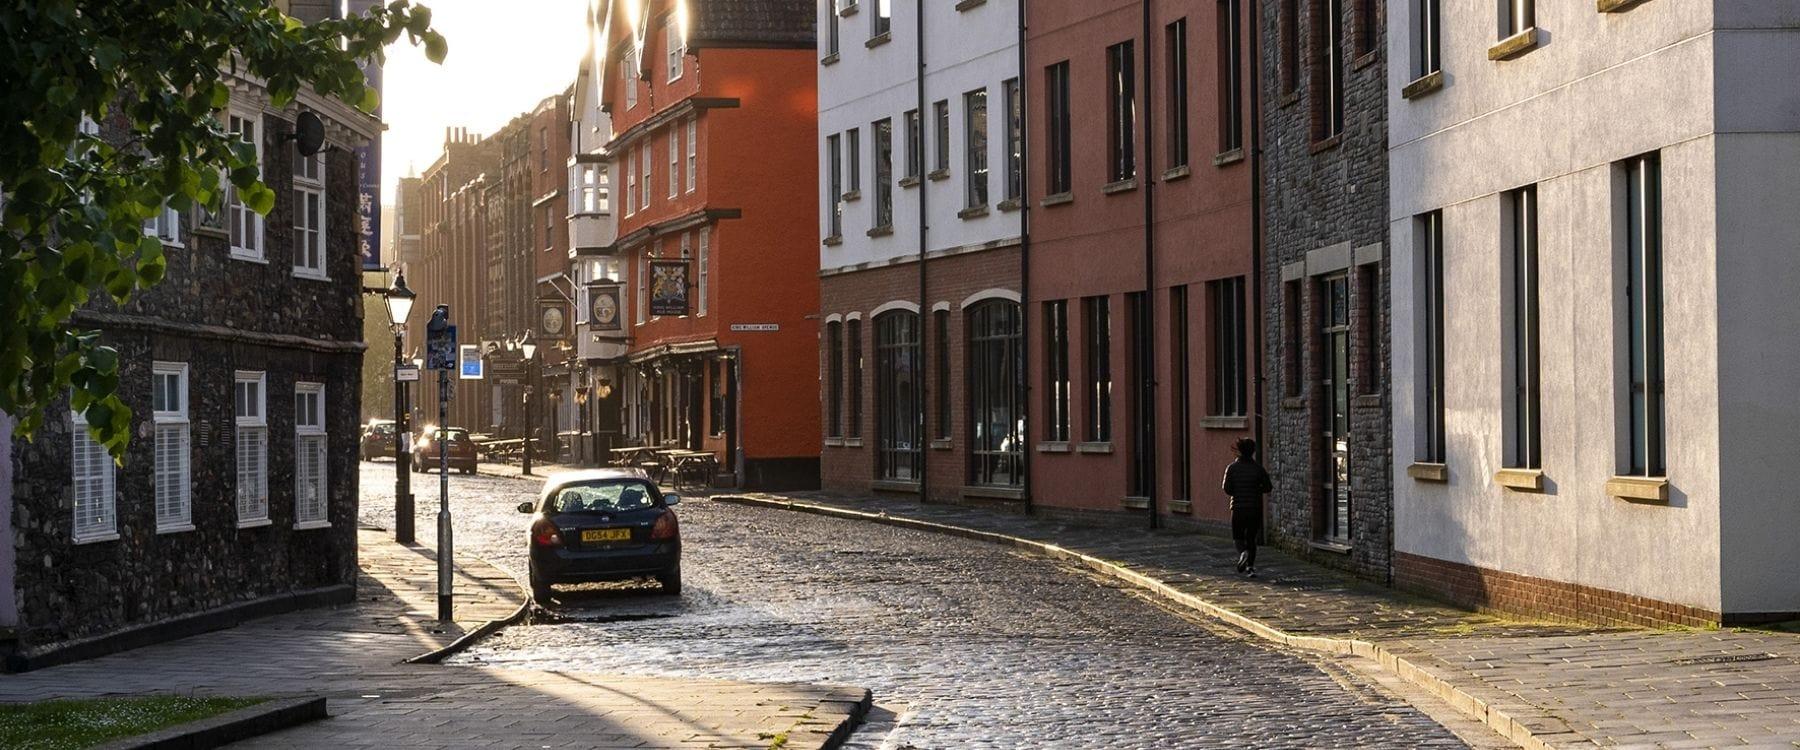 Bristol City Streets